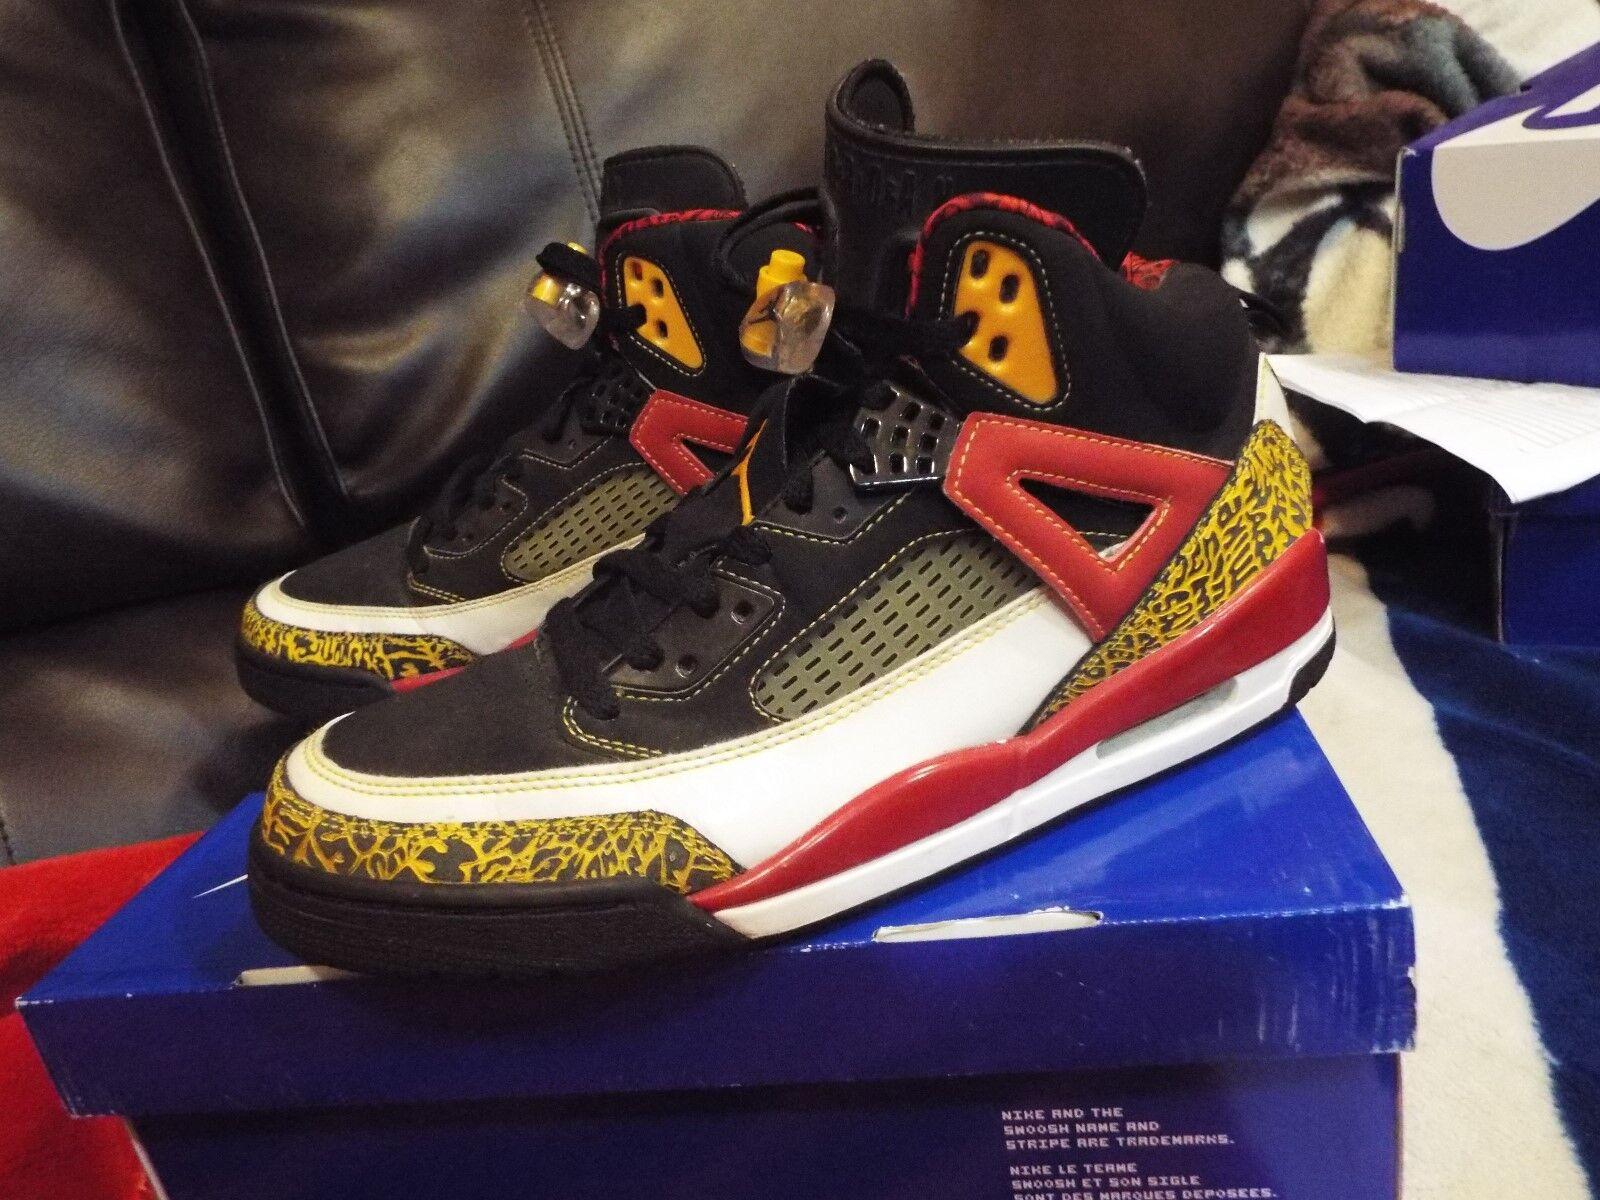 07 Nike Air Jordan SPIZIKE KING COUNTY BLACK TAXI RED WHITE gold 315371-071 SZ11